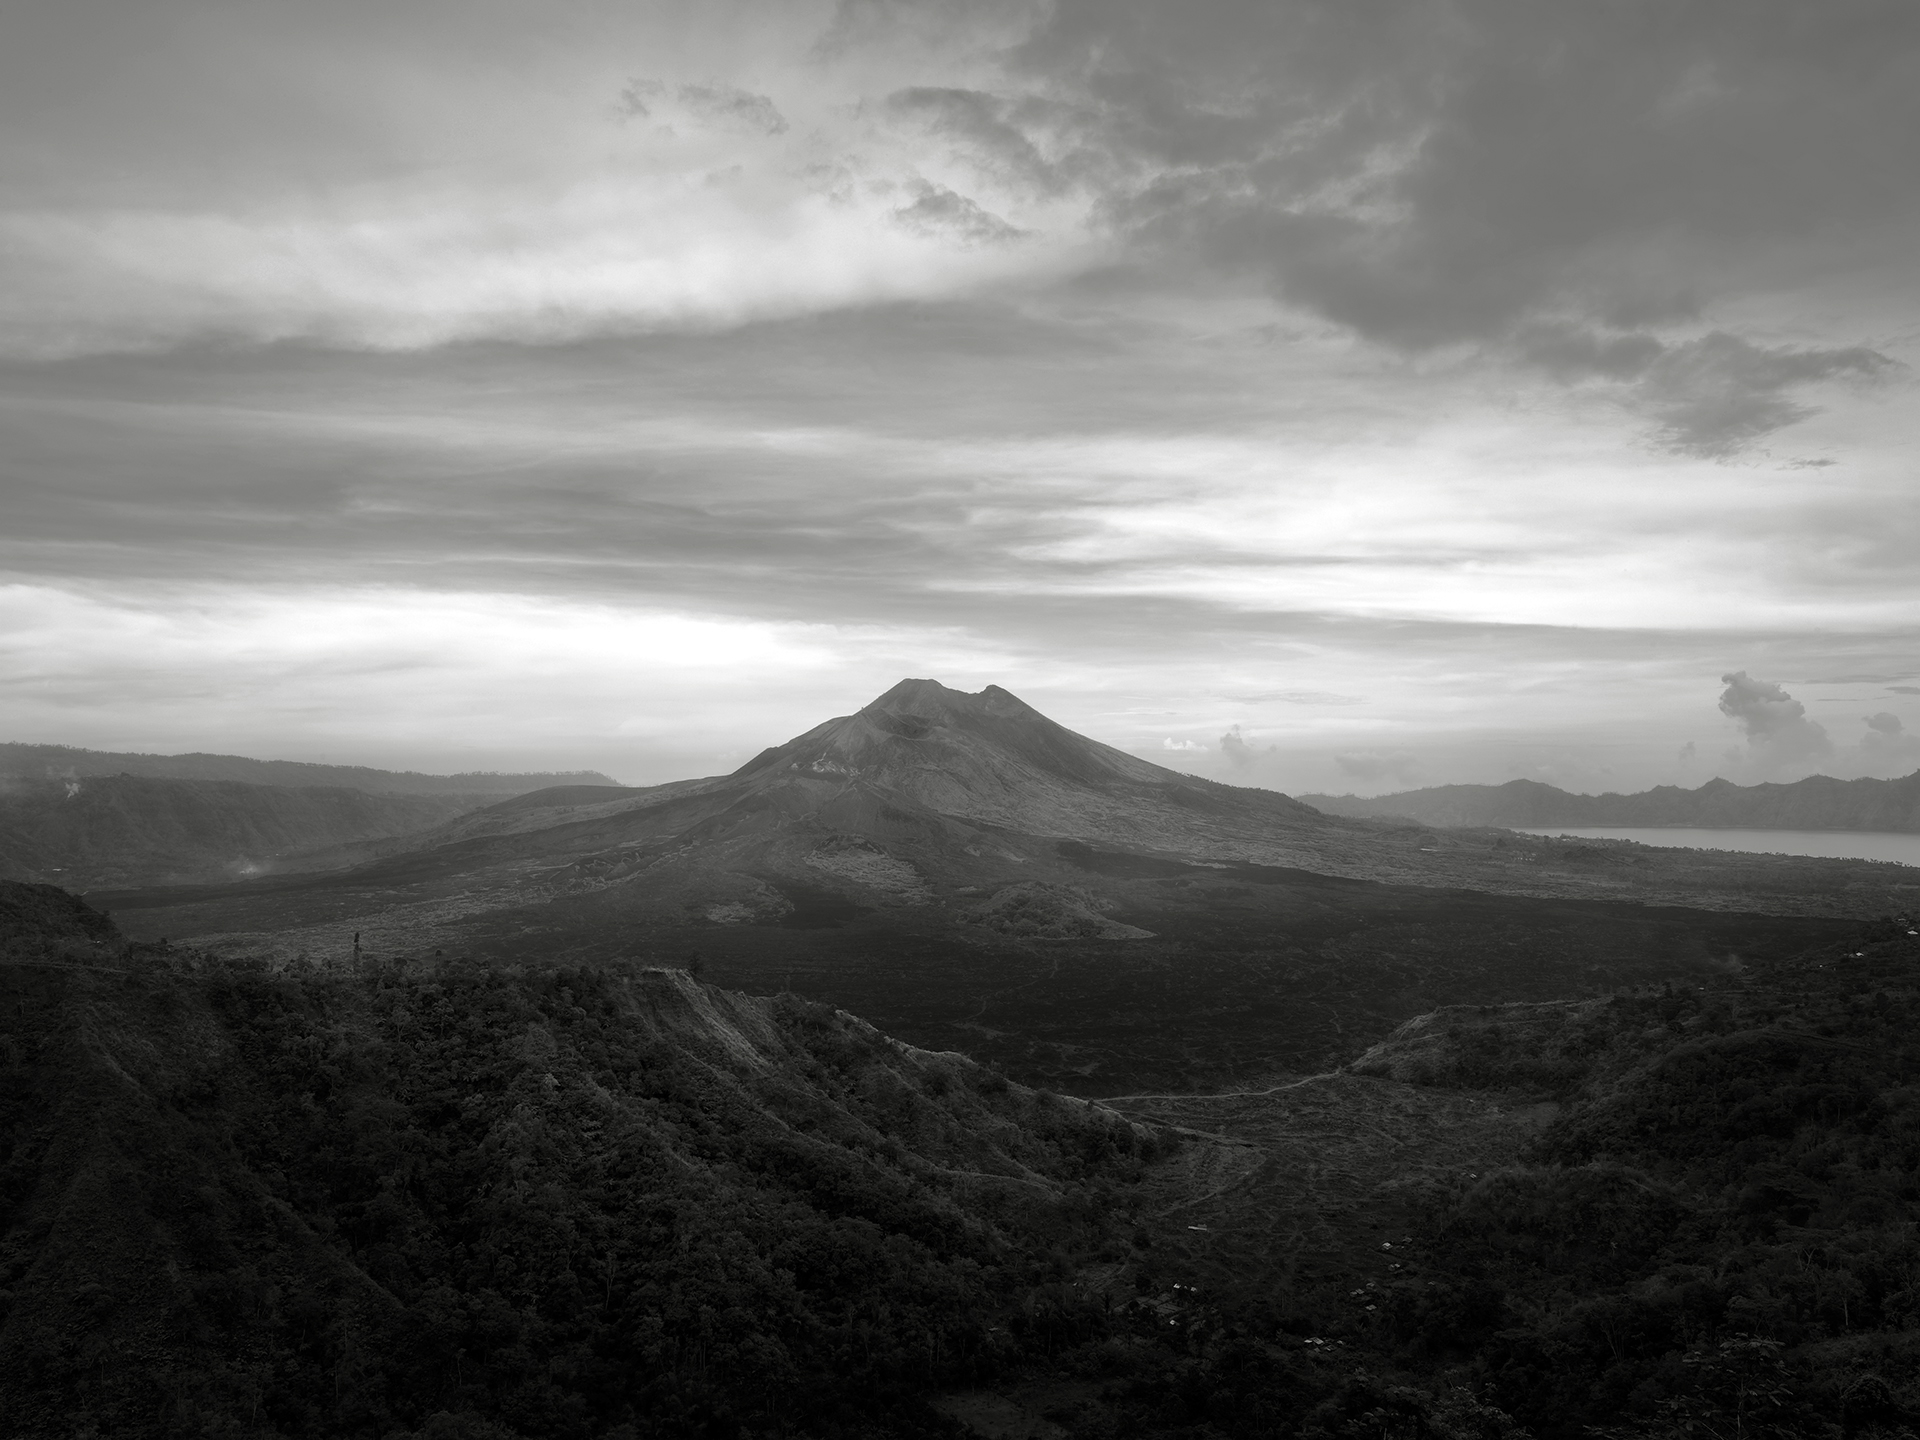 Mount Batur, Bali, Indonesia-2006 copy.jpg